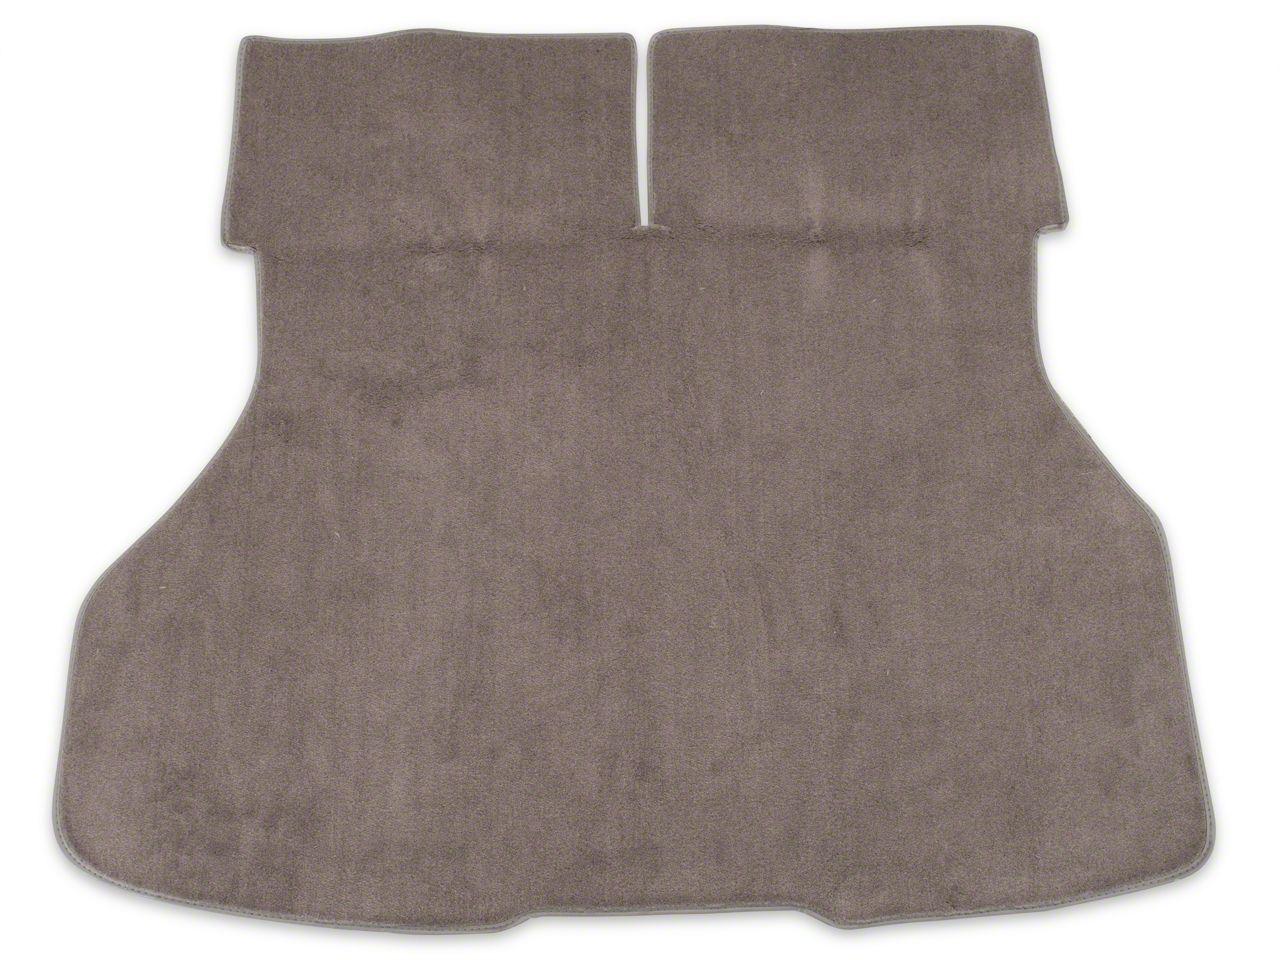 OPR Replacement Hatch Carpet - Smoke Gray (87-89 Hatchback)